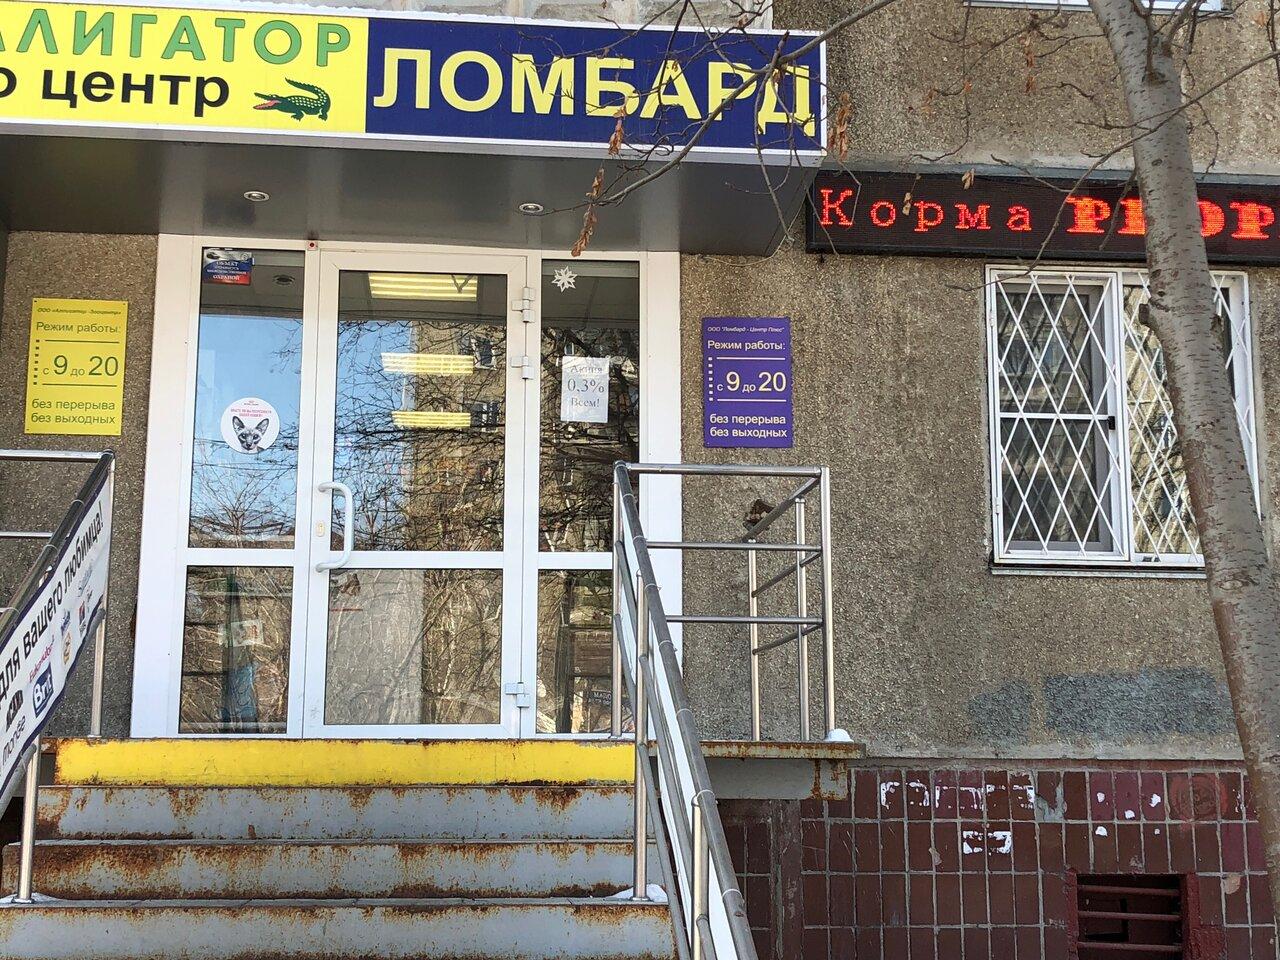 Москва сотрудников отзывы победа ломбард часы димитровград на сдам квартиру